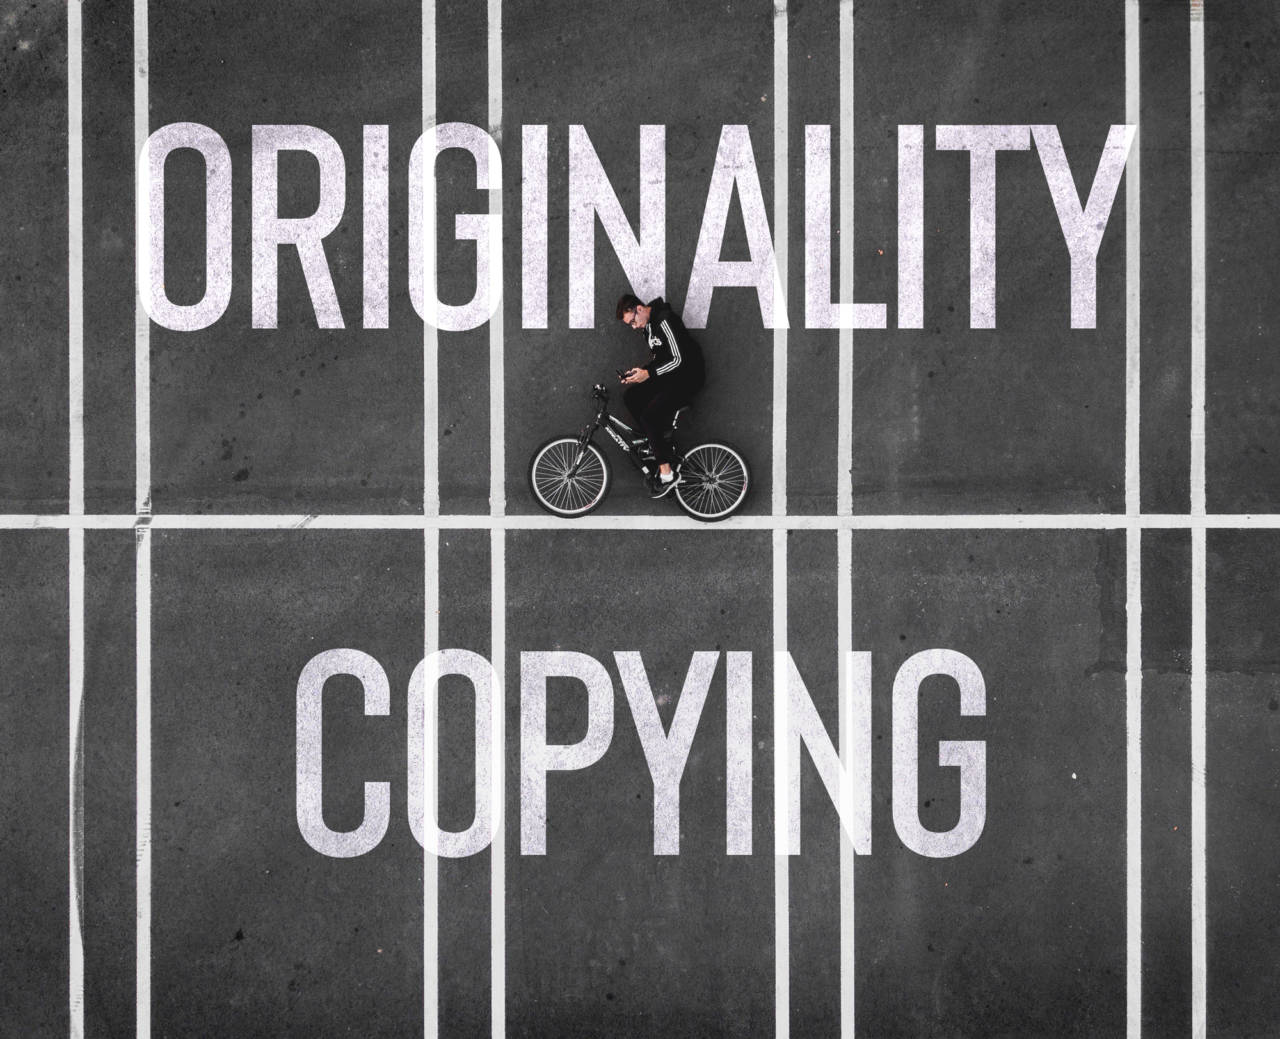 Authentic Branding and Originality